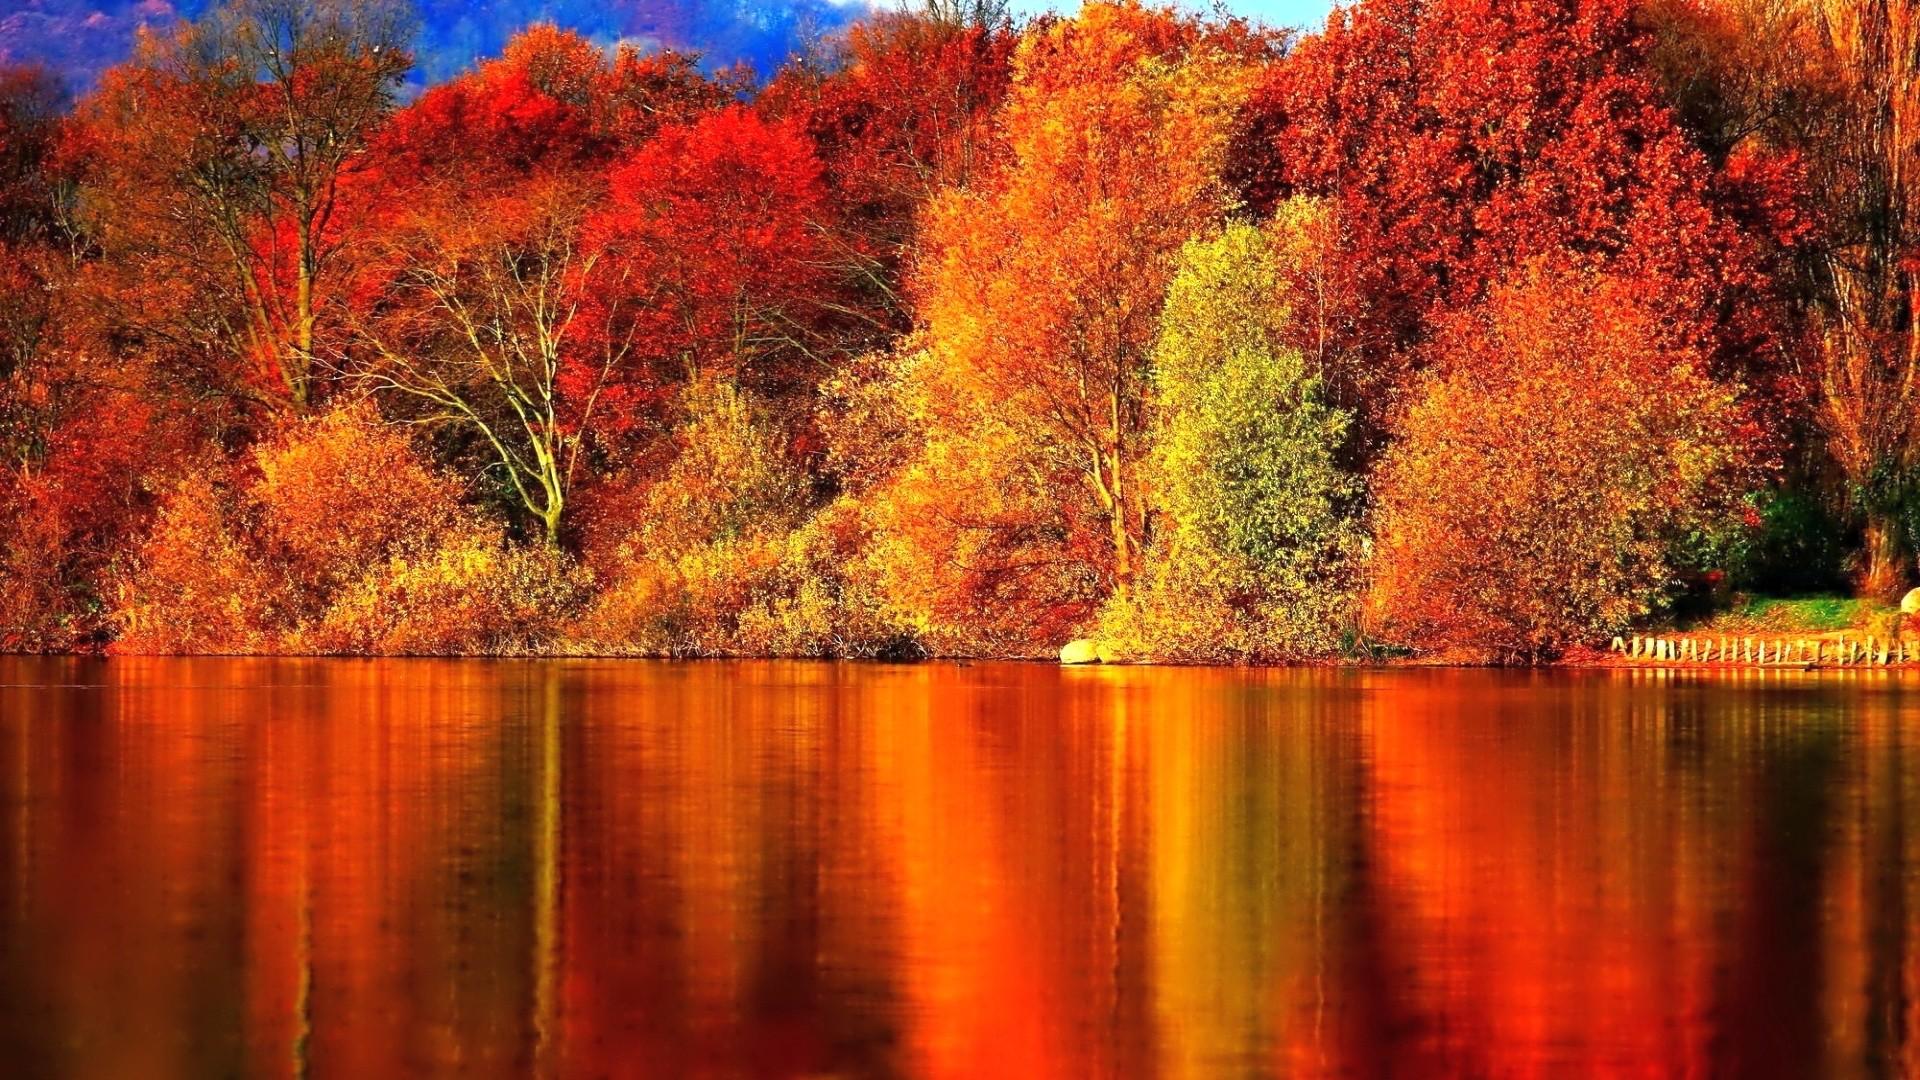 Wallpaper Of Fall Season 56 Images